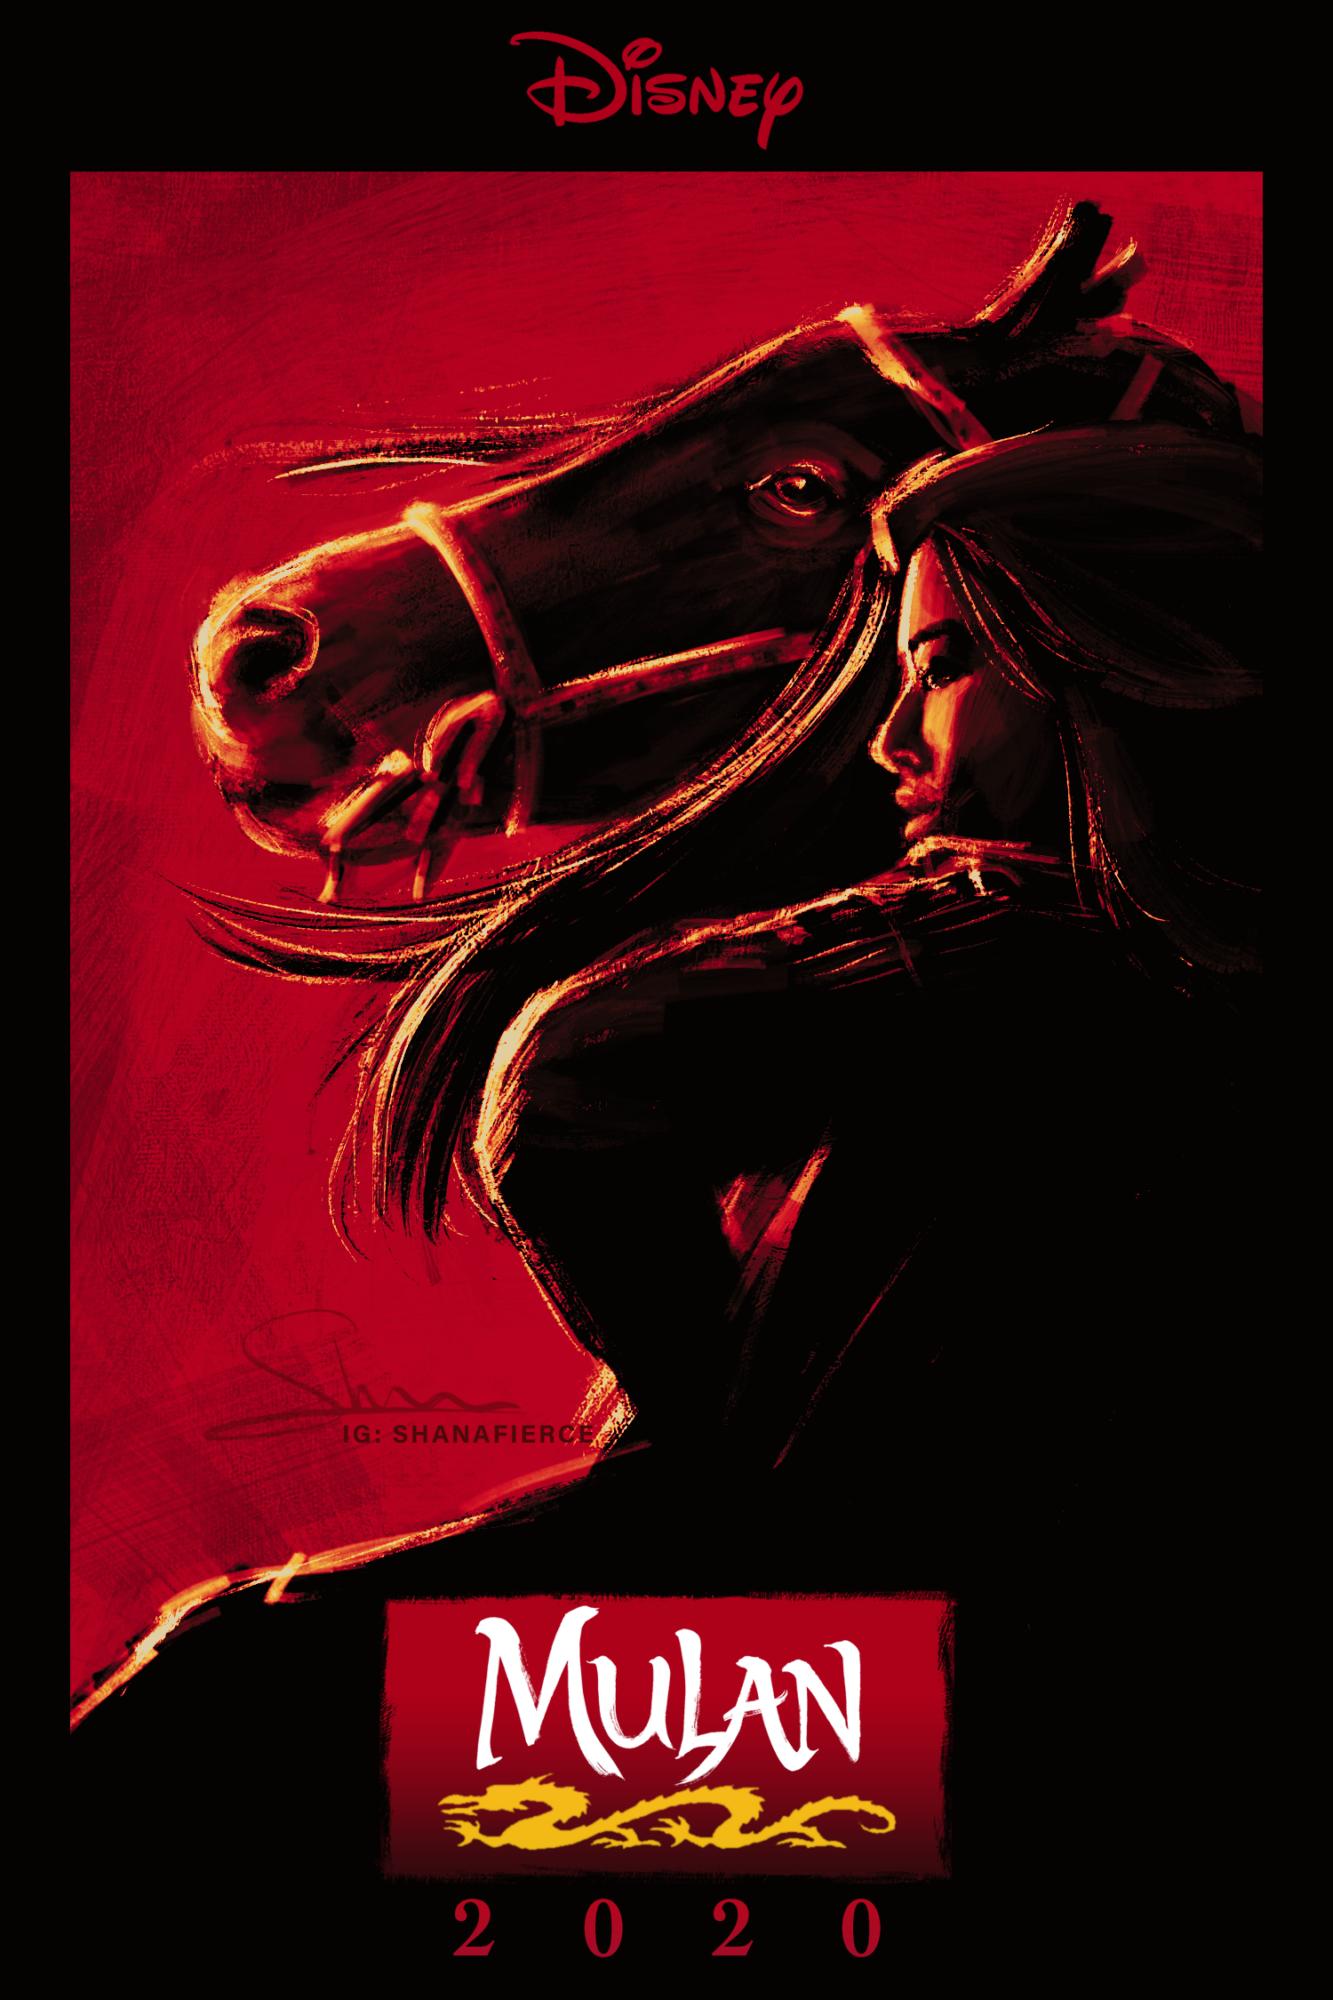 Mulan 2020 Posterspy